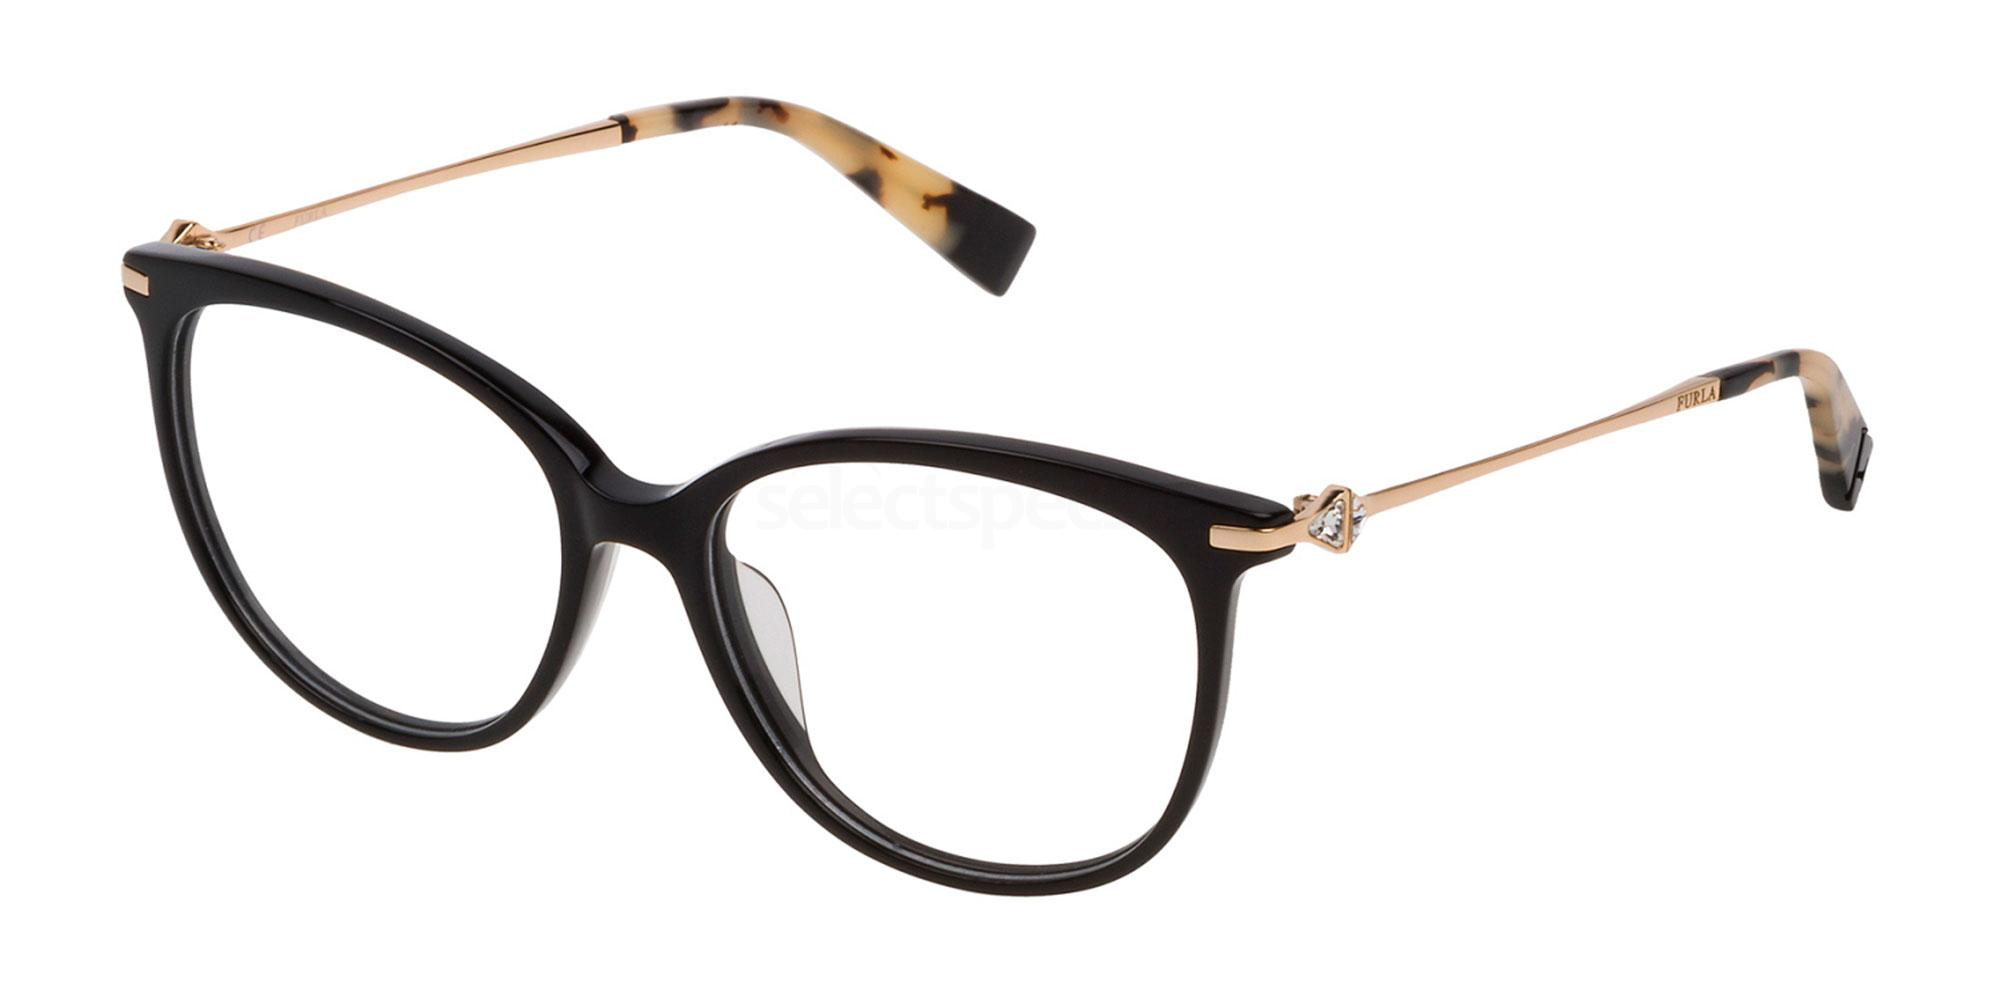 0700 VFU186S Glasses, Furla